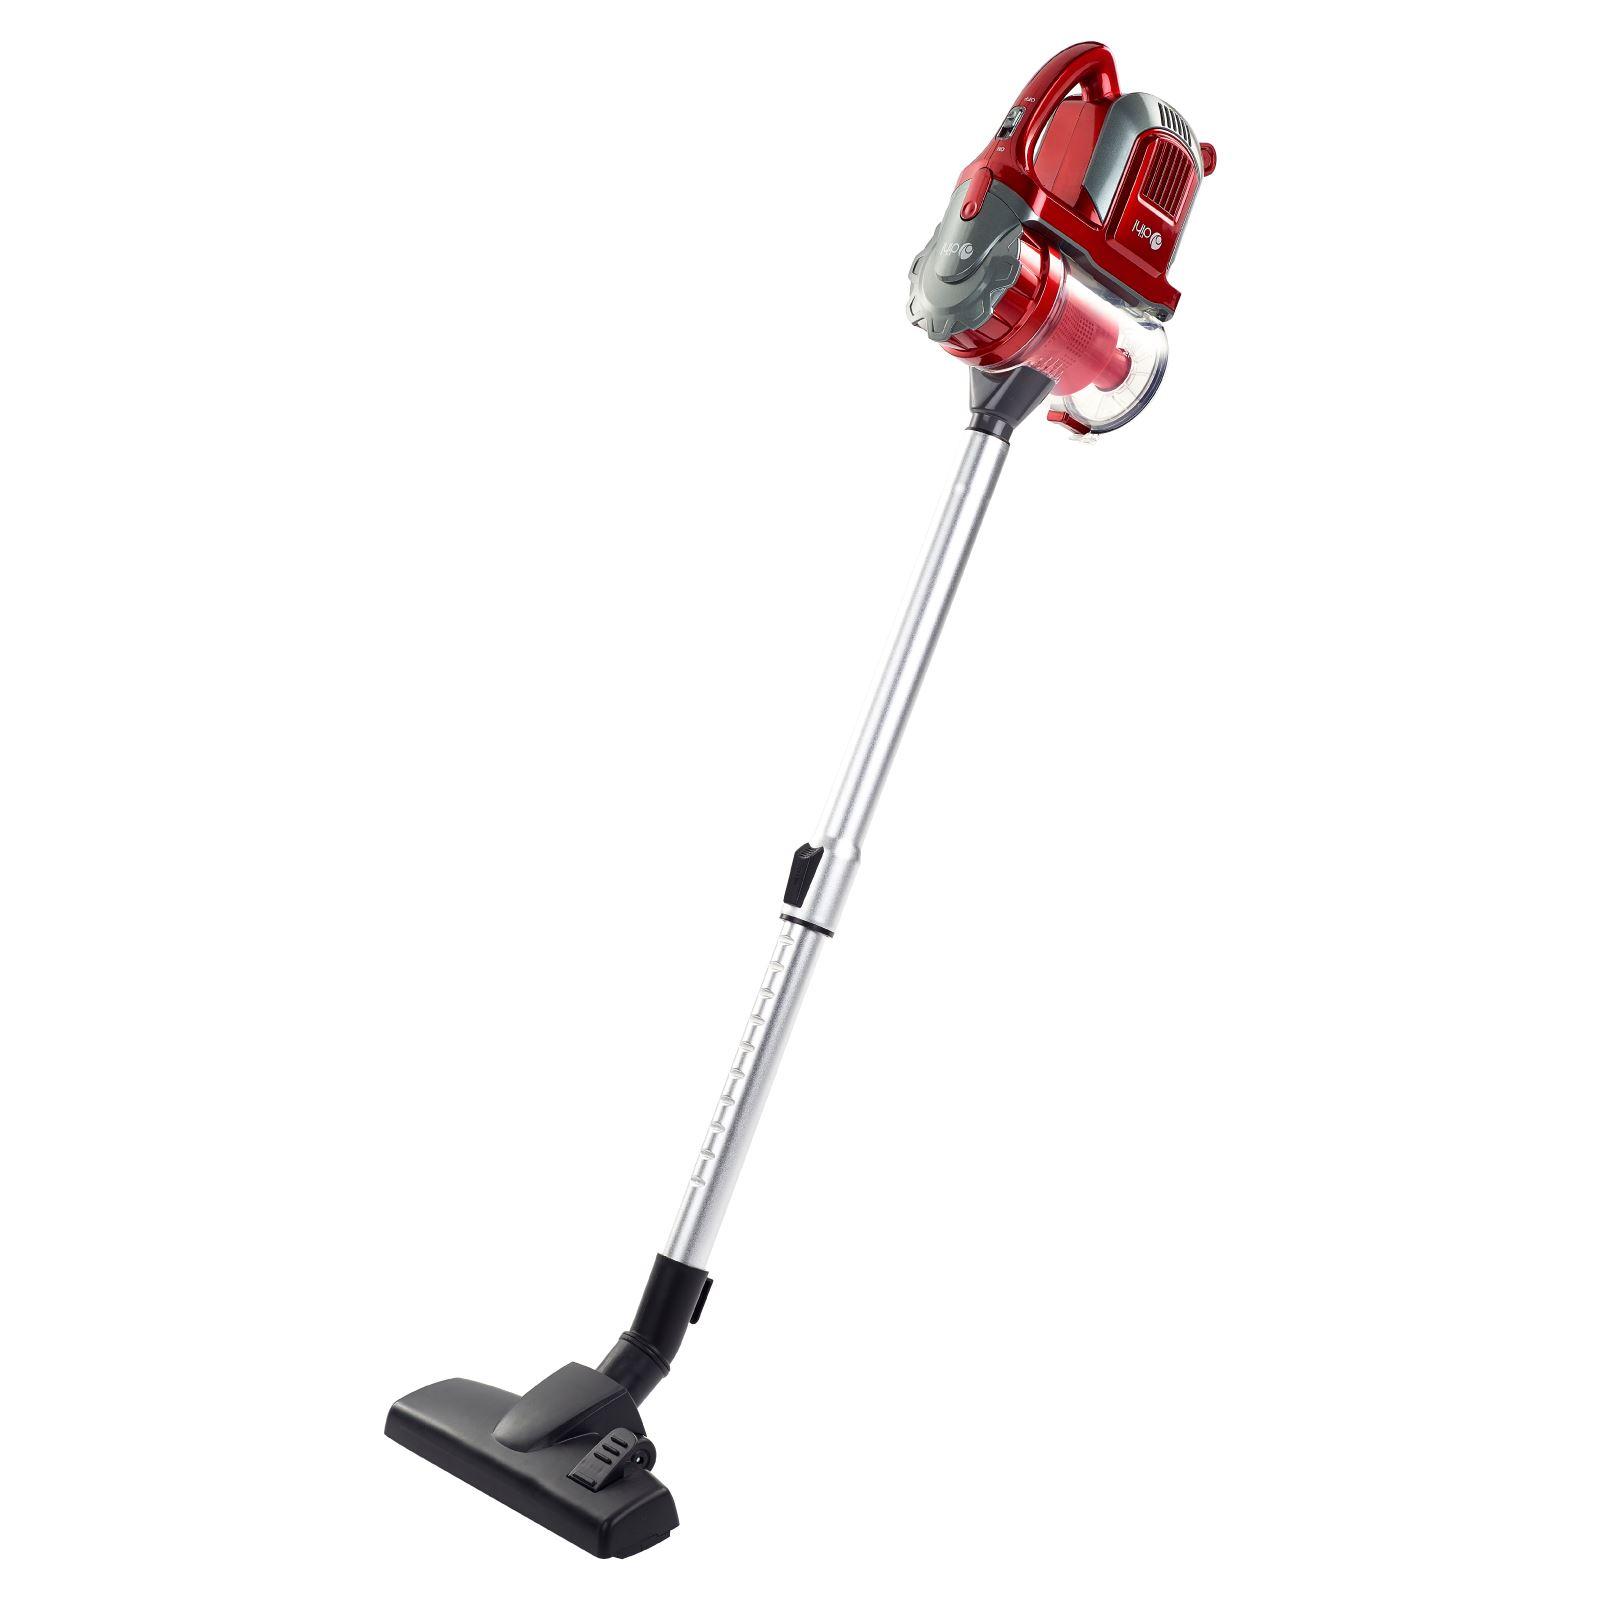 dihl cordless 130w handheld vacuum cleaner rechargeable 21 6v stick vac bagless. Black Bedroom Furniture Sets. Home Design Ideas